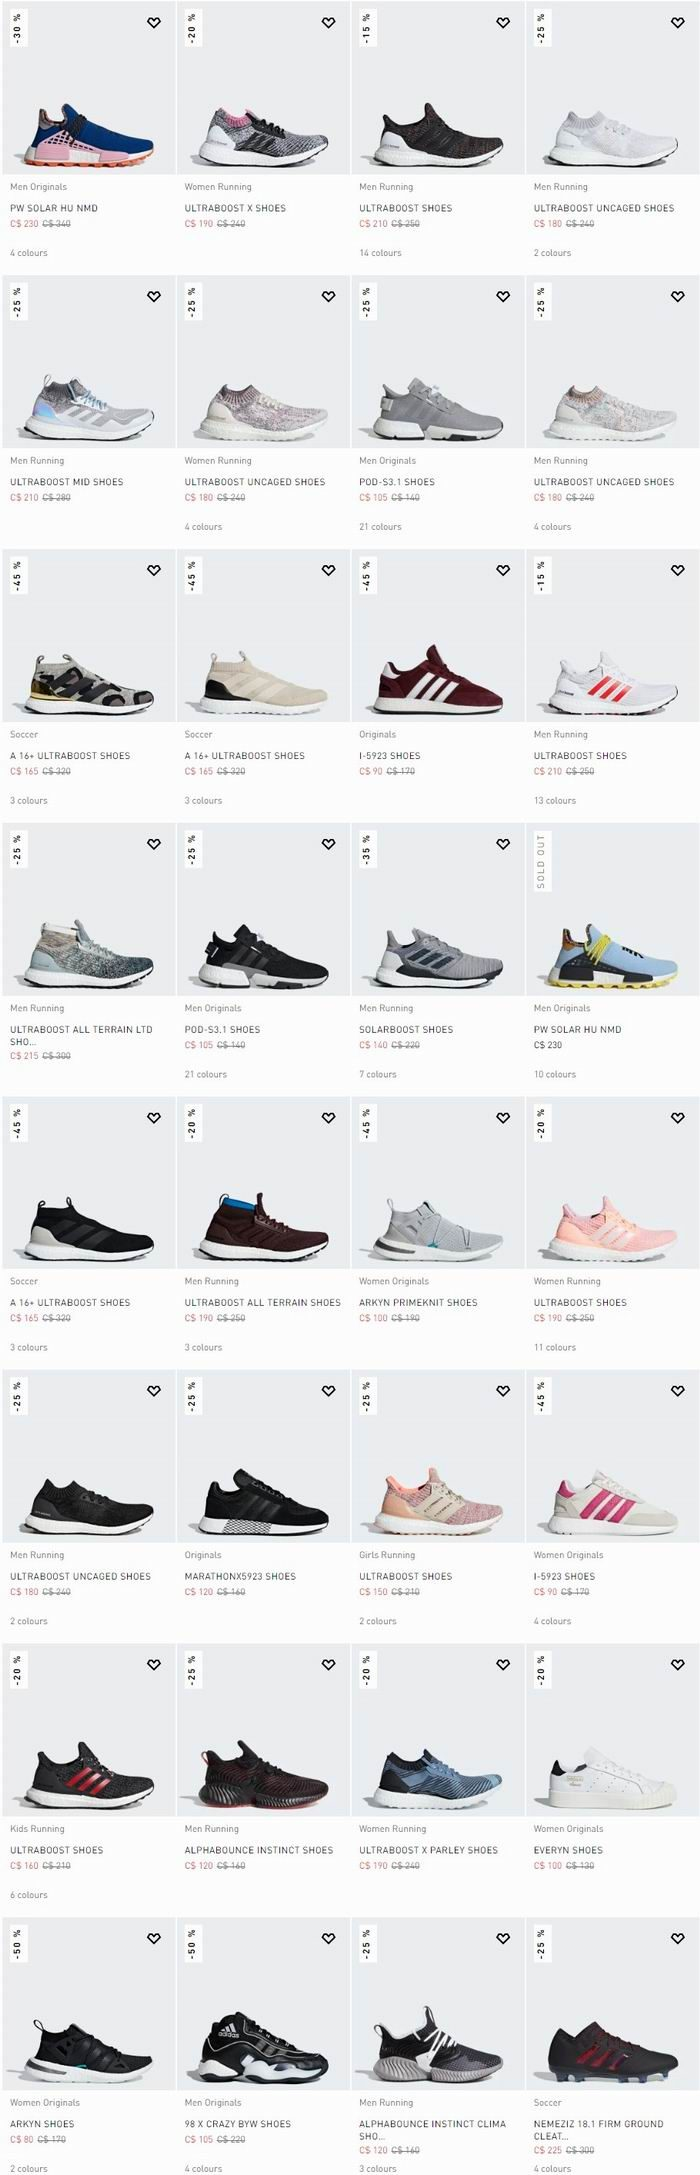 Adidas长周末大促!精选运动鞋、运动服饰等3折起+购3件以上额外6.7折!收NMD、ULTRABOOST潮鞋、老爹鞋!